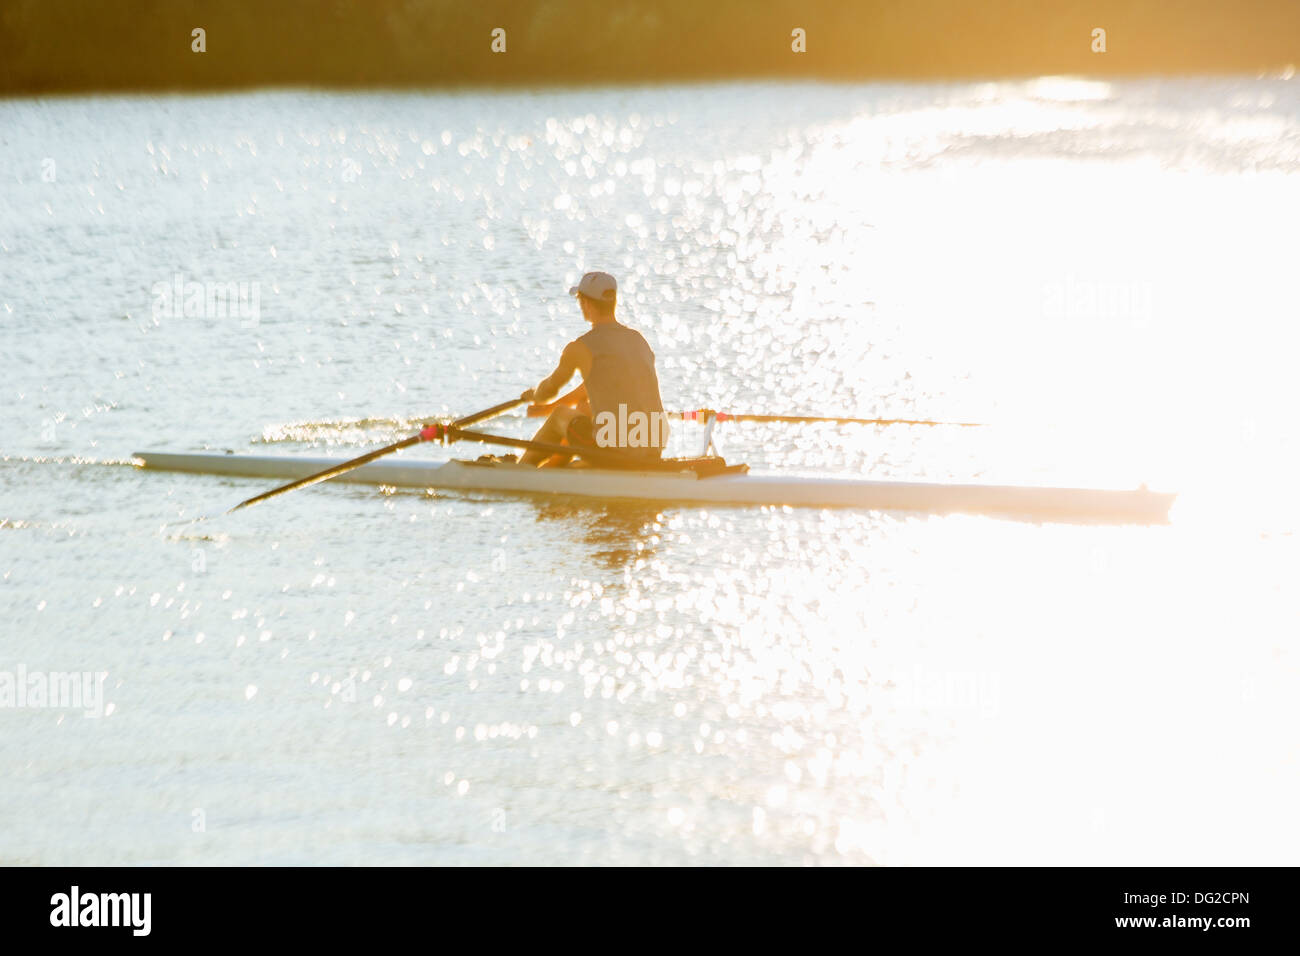 Canada,Ontario,Saint Catharines, Royal Henley Regatta, des célibataires l'aviron Photo Stock